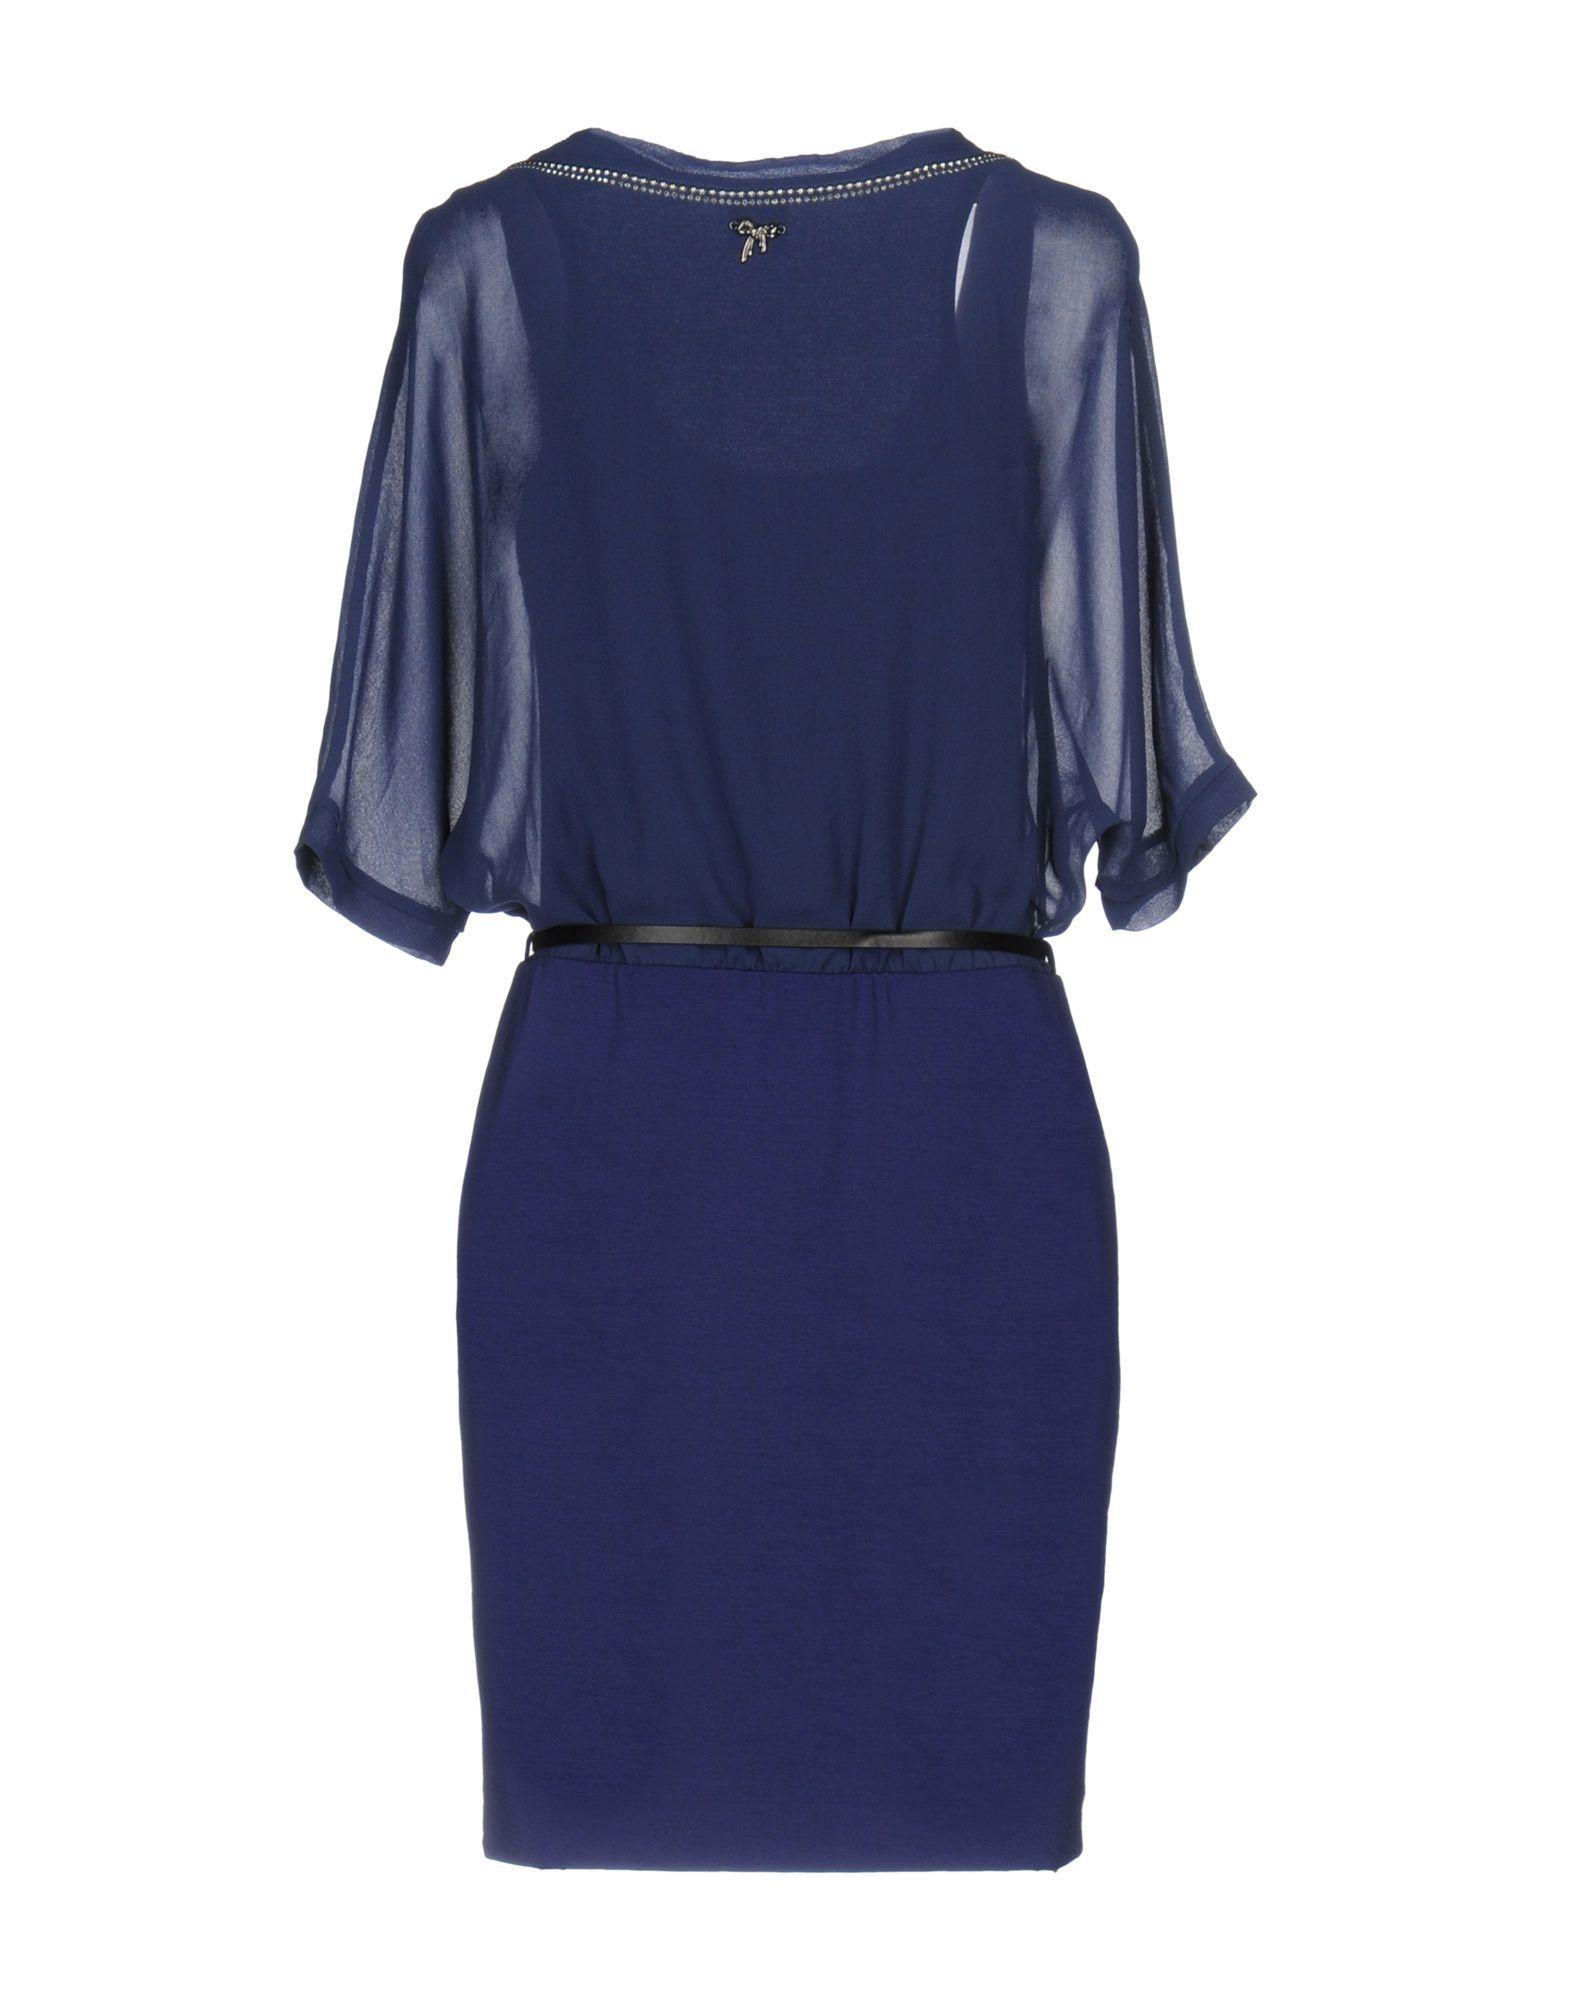 Scee By Twinset Dark Blue Short Sleeve Dress